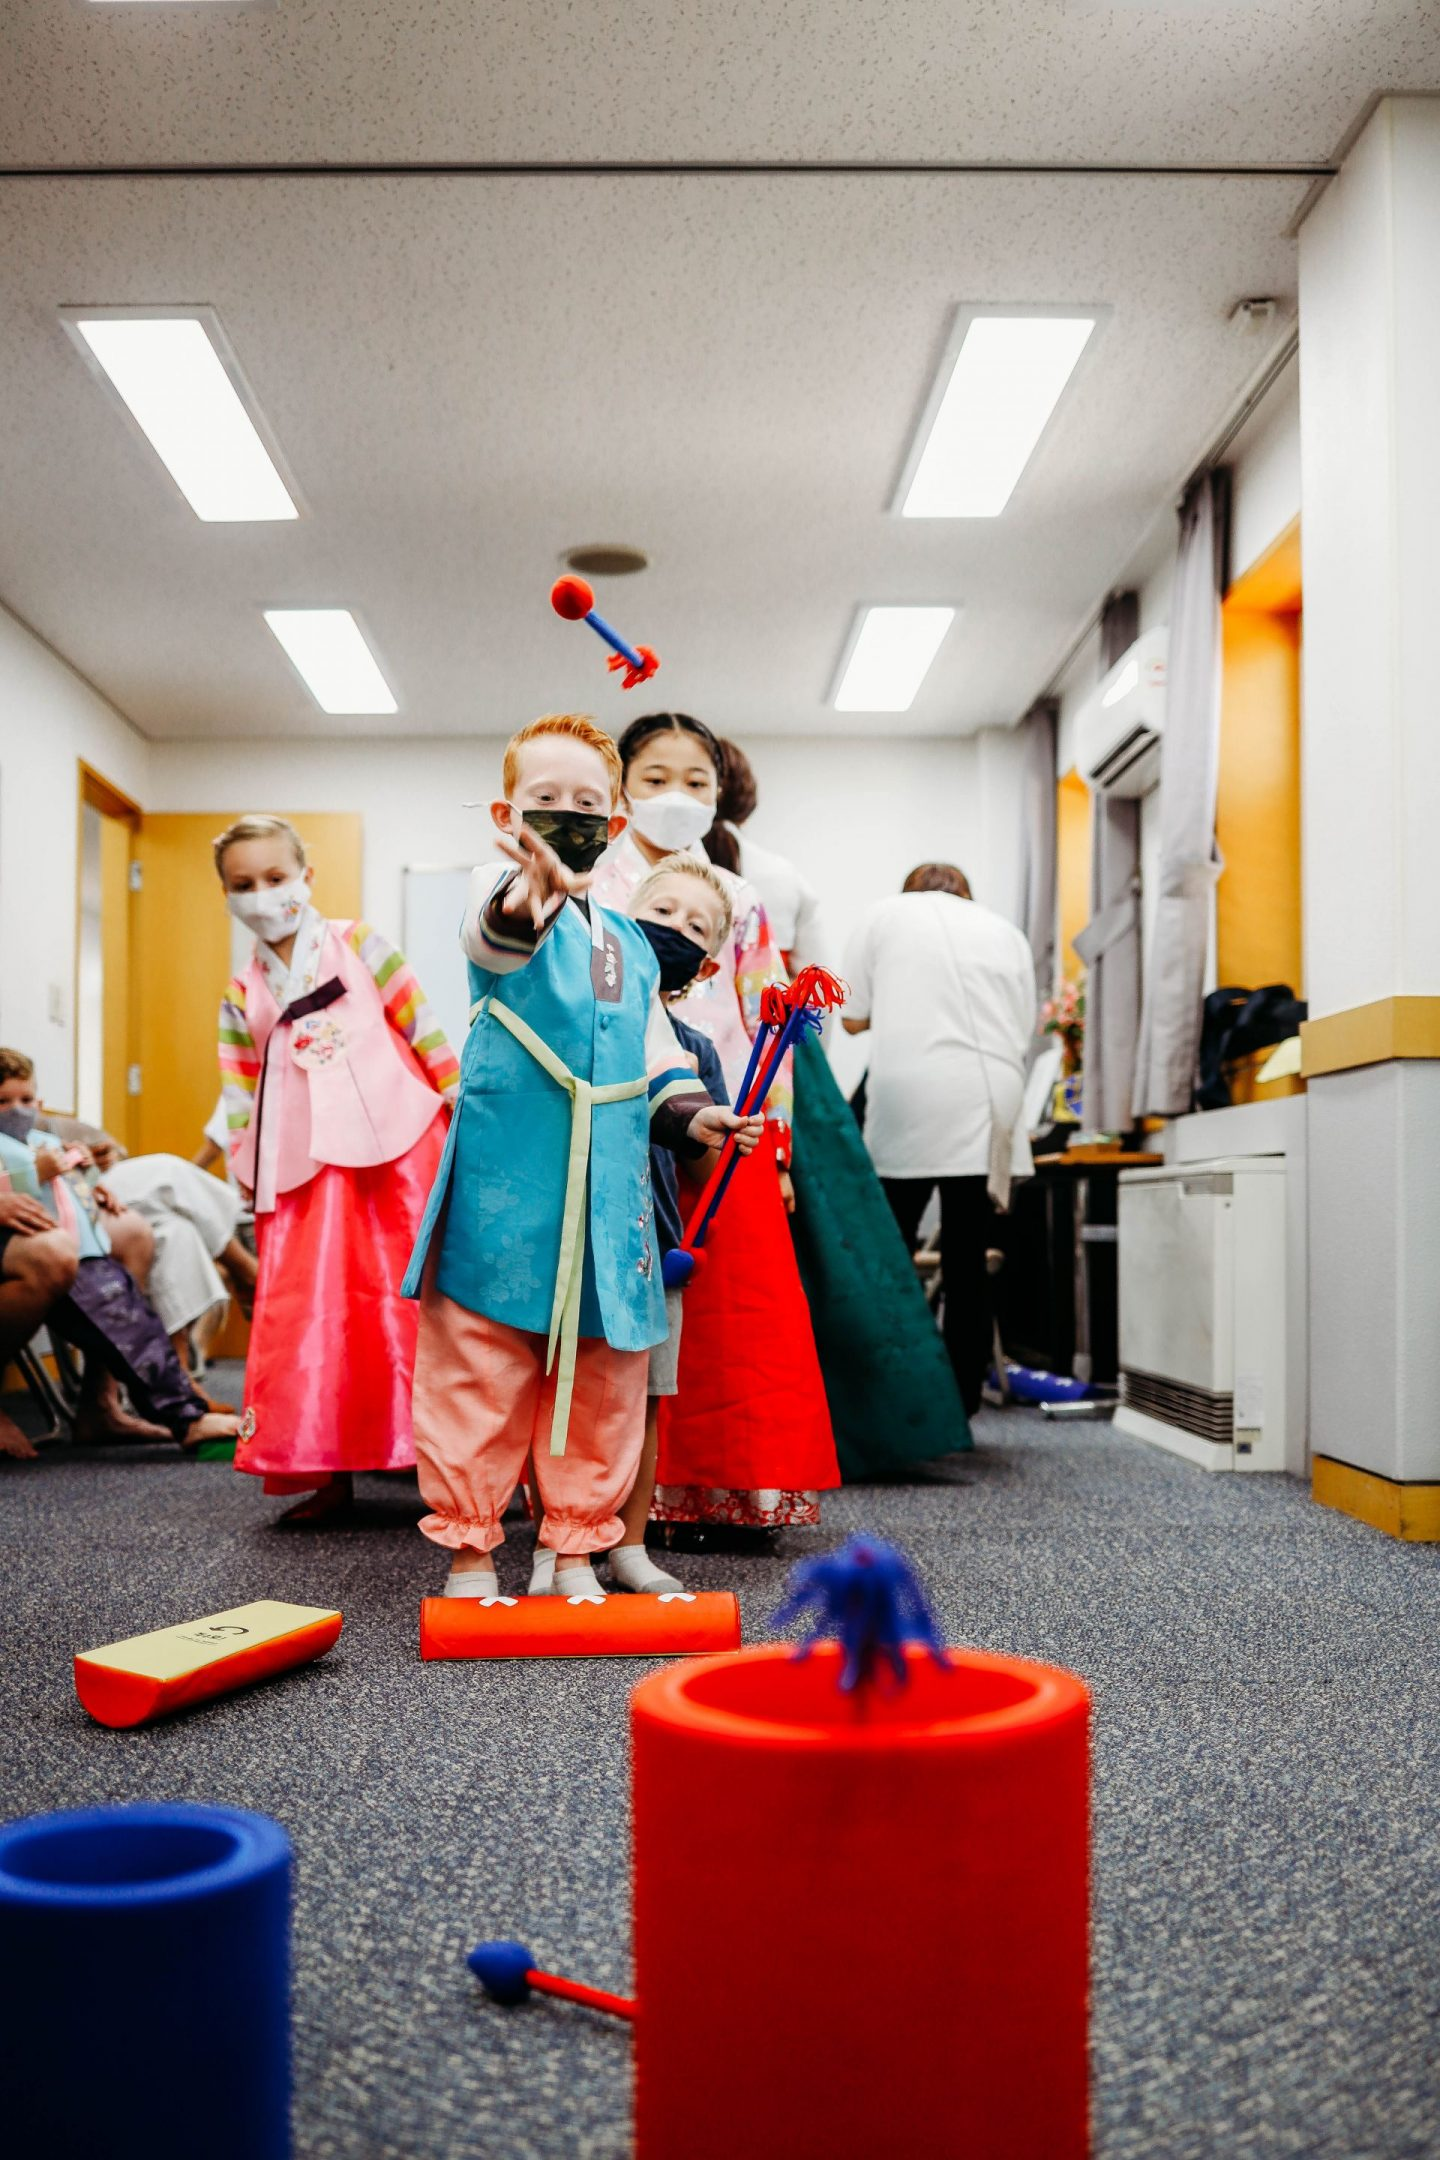 traditional chuseok games